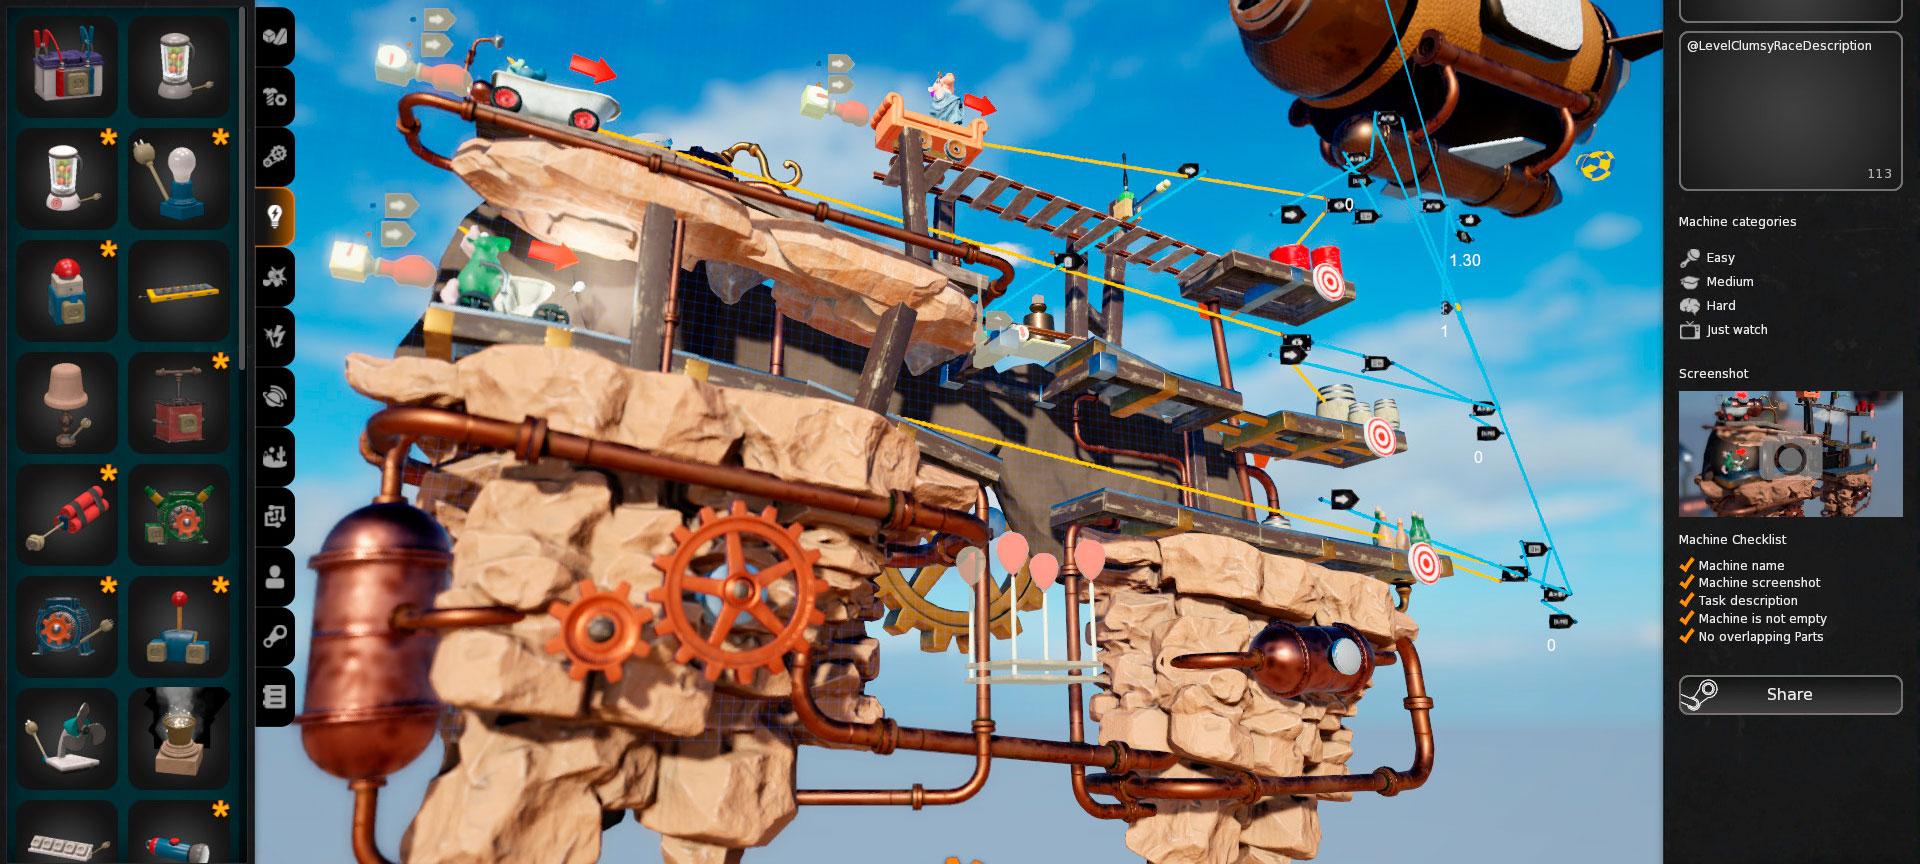 Crazy Machines 3 Análisis 5